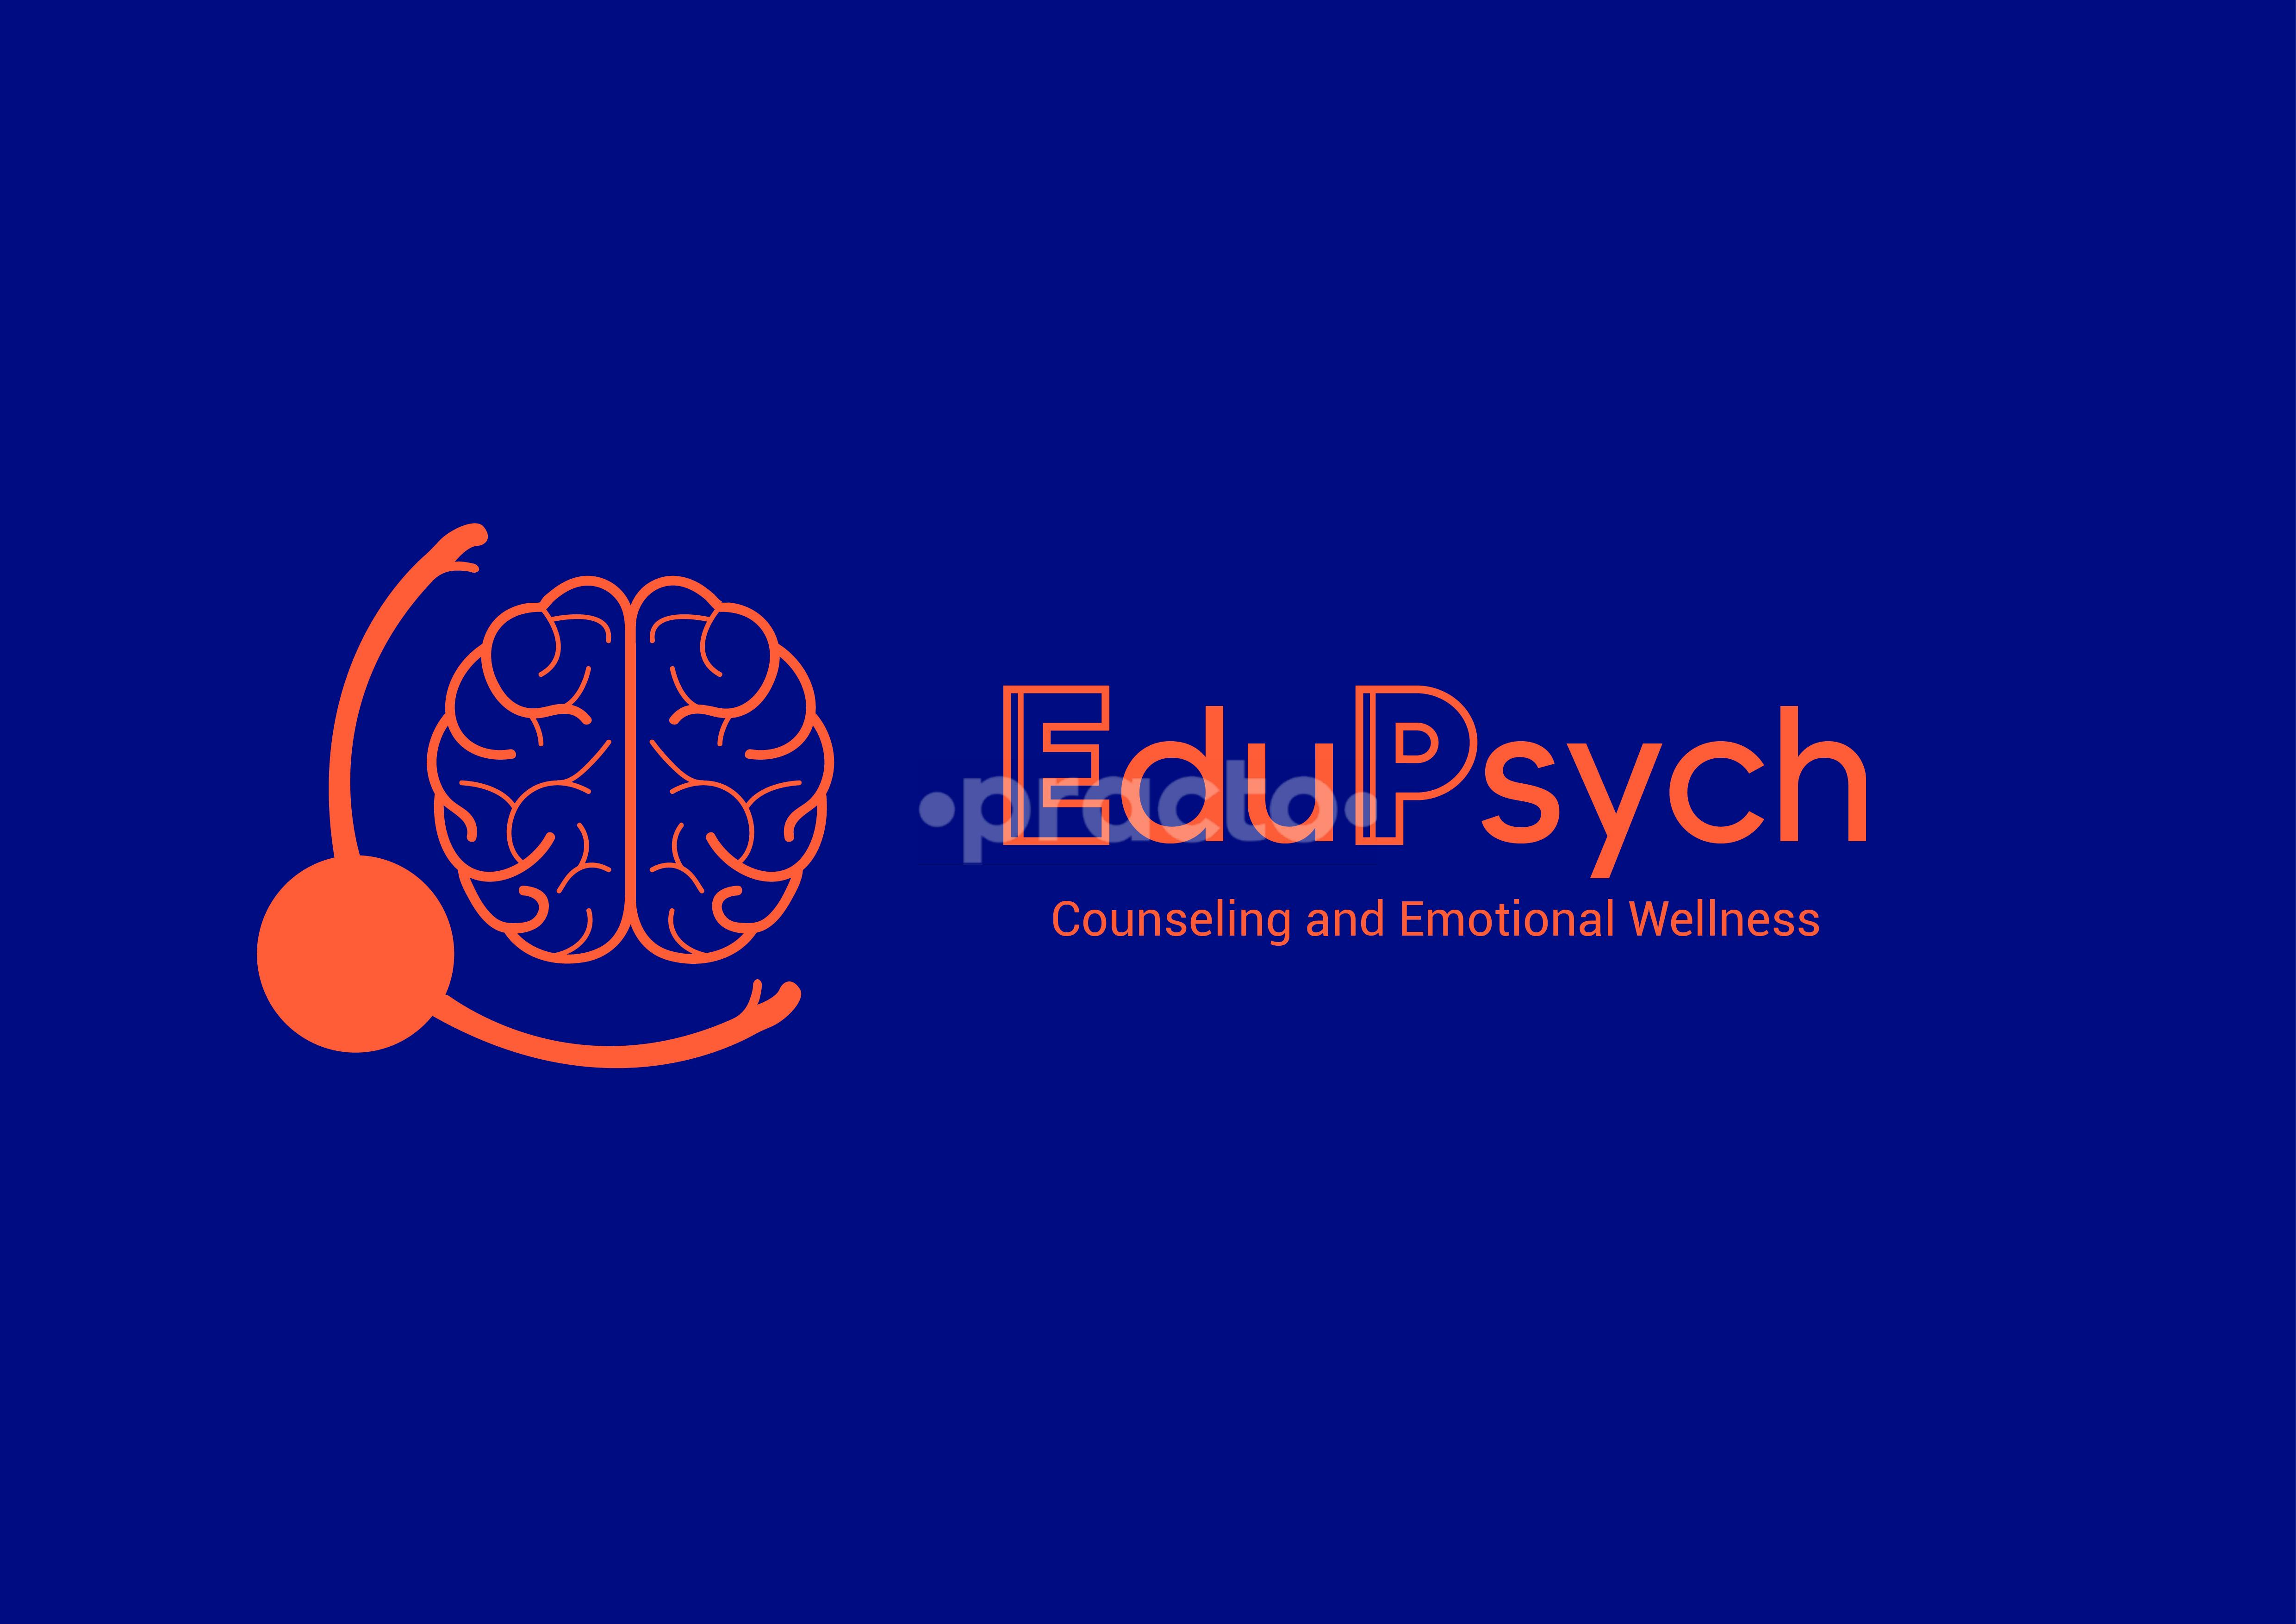 EduPsych